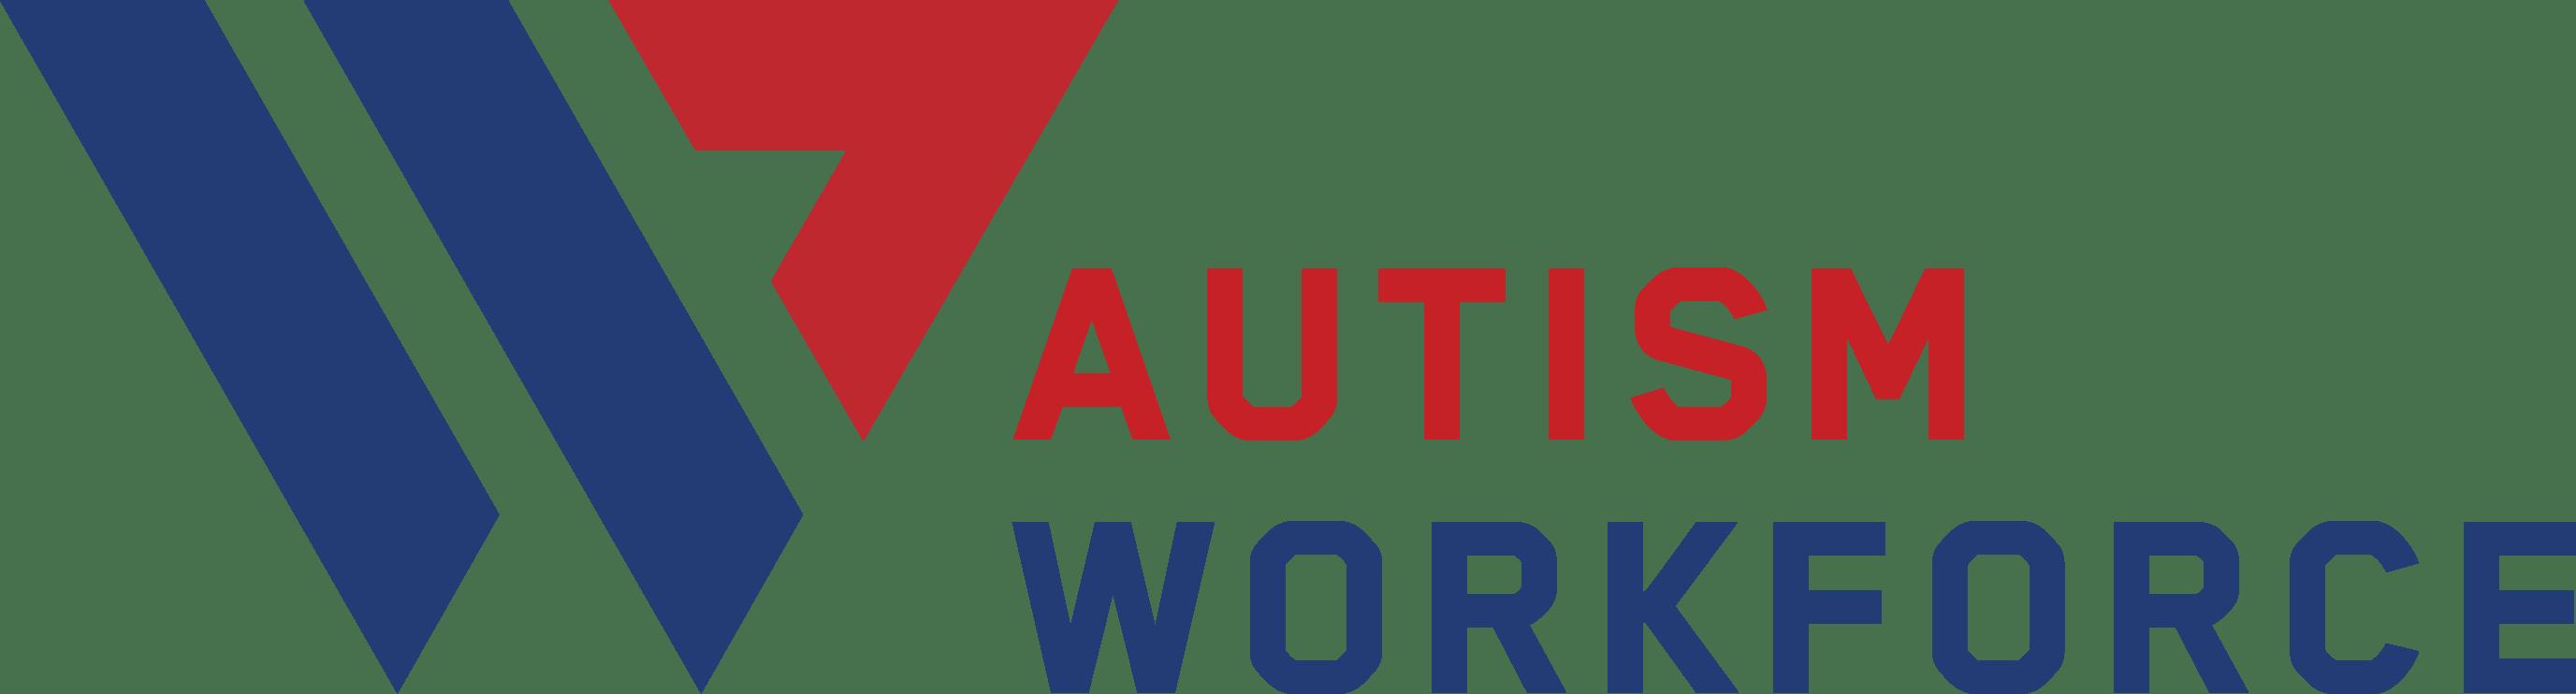 Autism Workforce logo